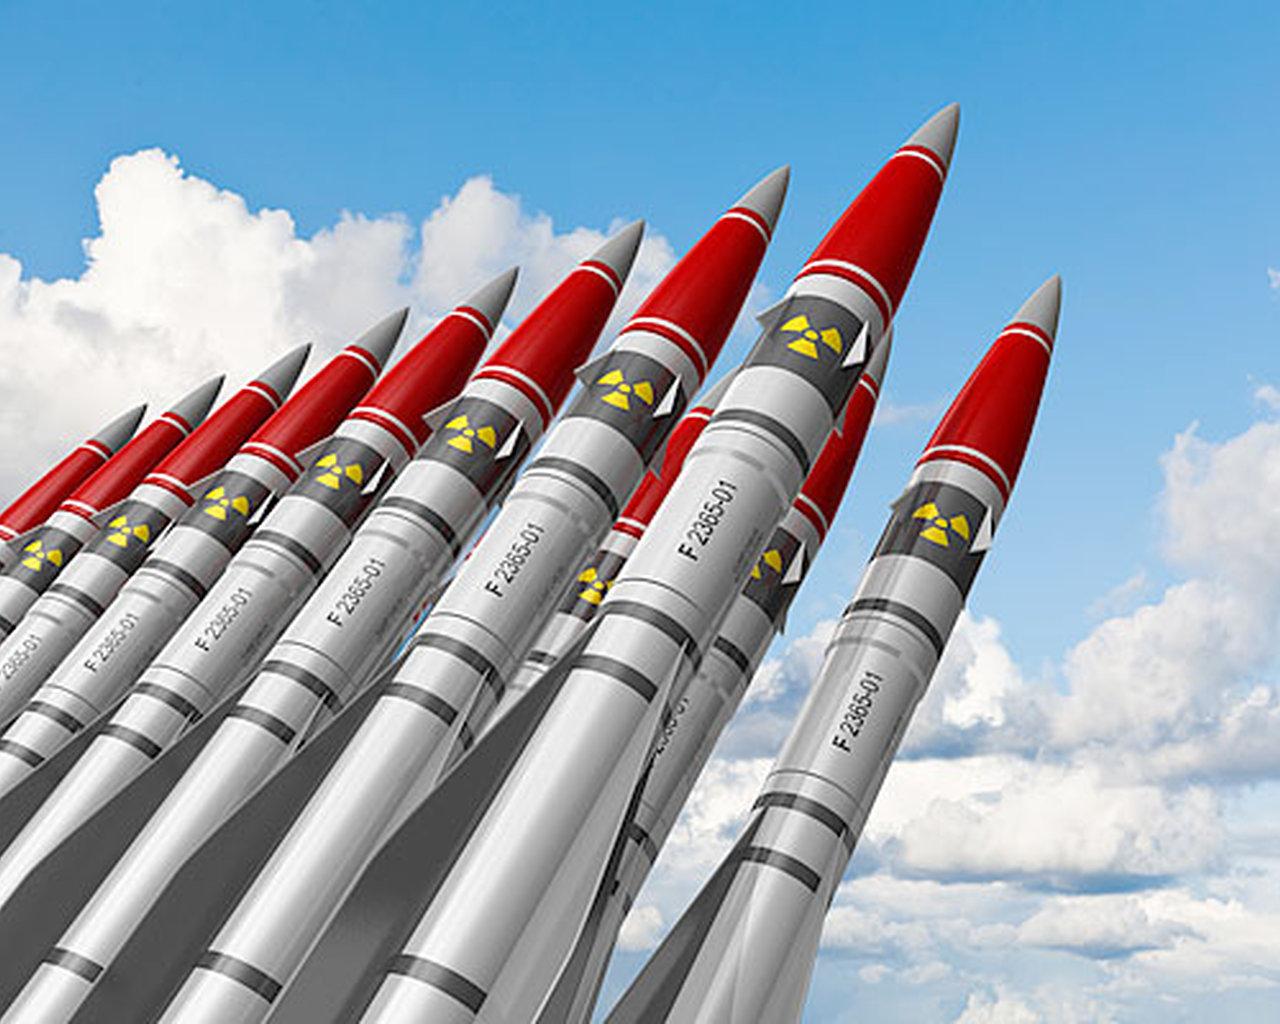 Atomraketen - Symbol des kalten Krieges. (Bild: Oleksiy Mark, photos.com)